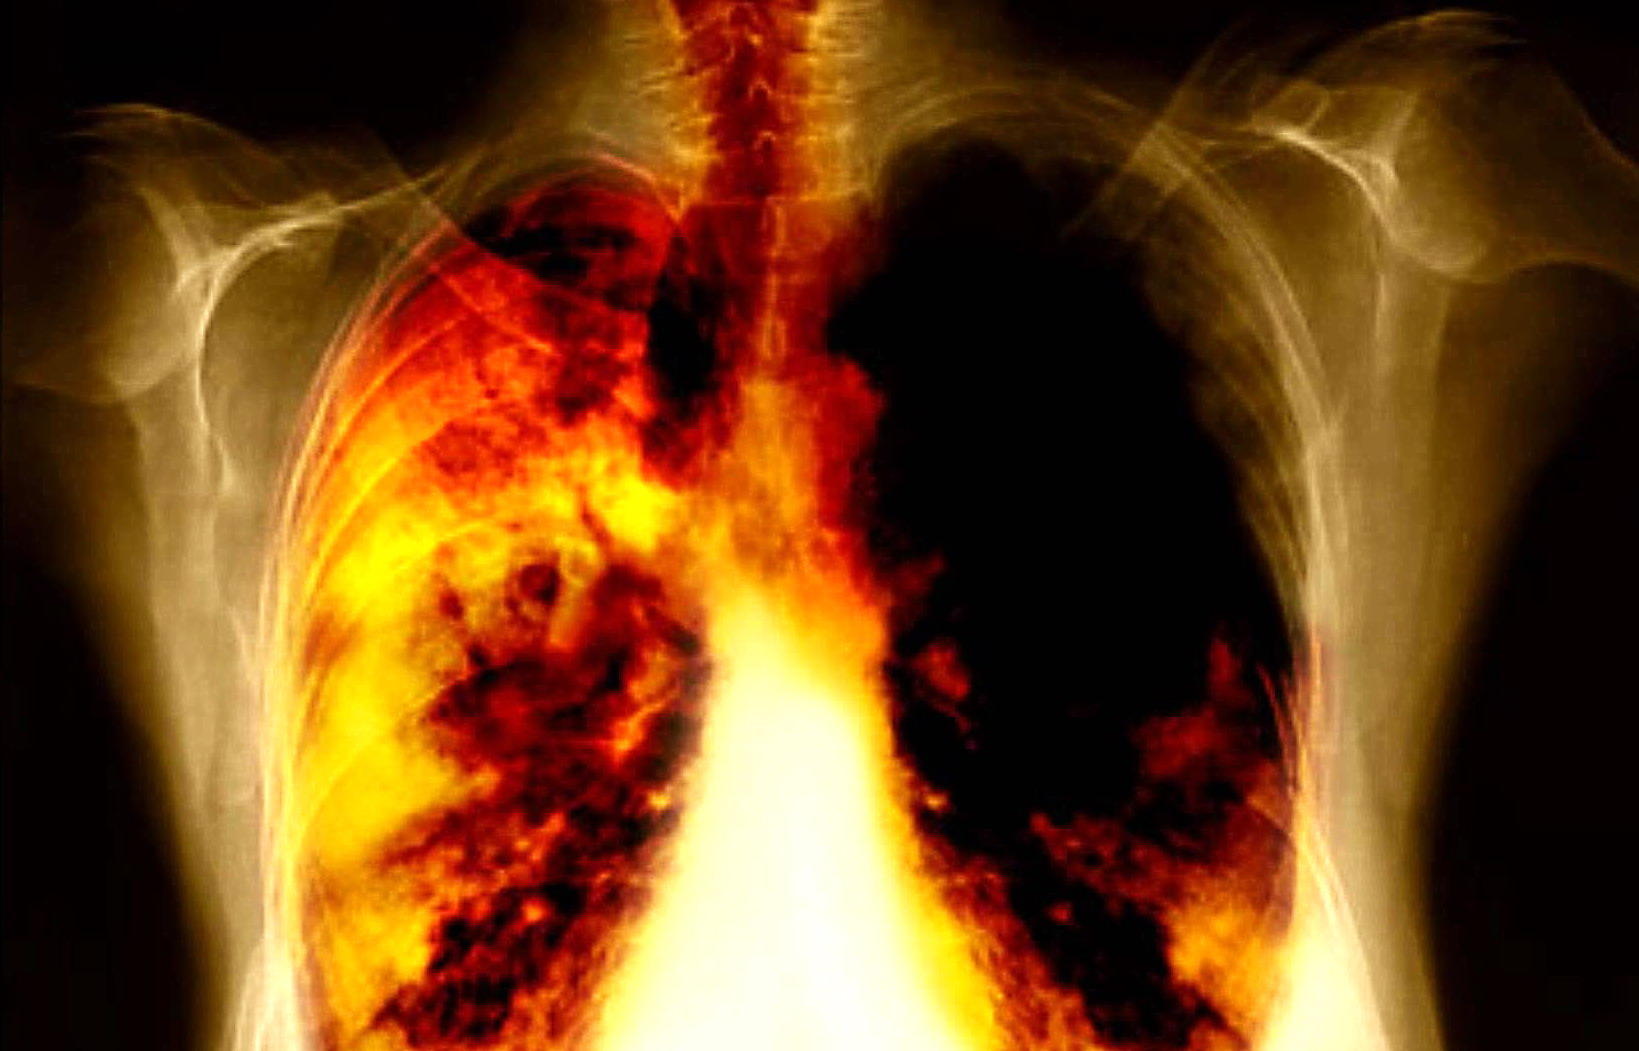 Термометр артериального давления - Cardiopatia ipertensiva prova malattie ansia e